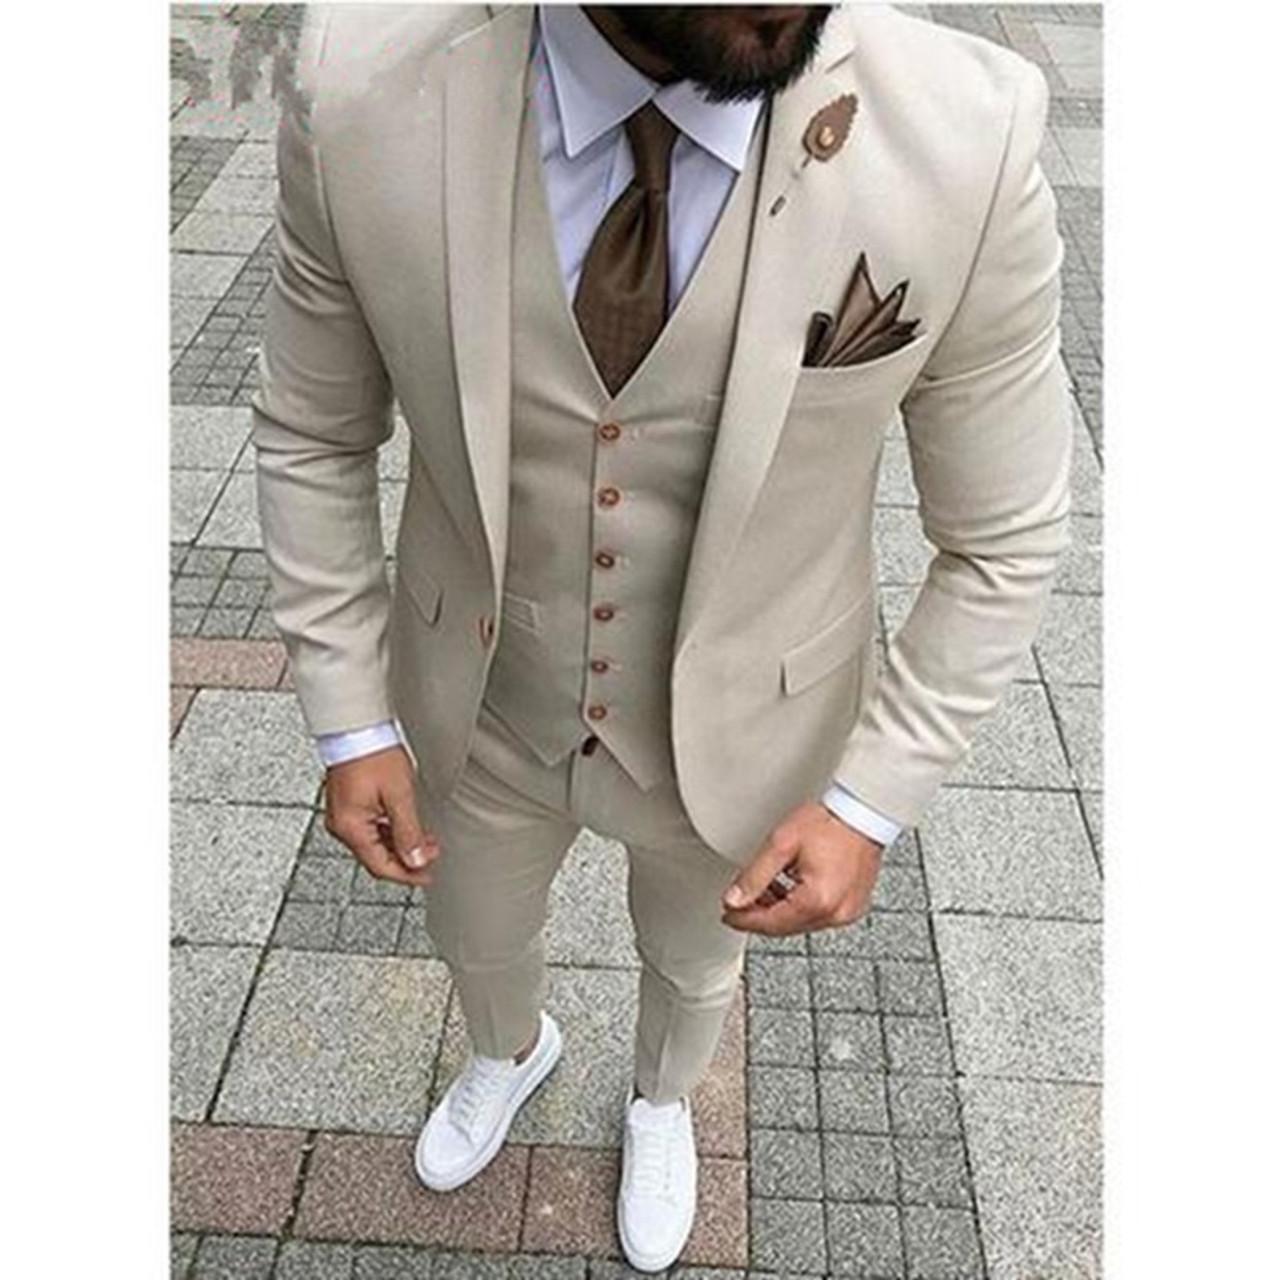 0fca6788b7611 2018 Latest Designs Beige Men Wedding Suit Groomsmen Tuxedo Slim Fit Three  Piece Groom Wear Mens Suits Custom Made